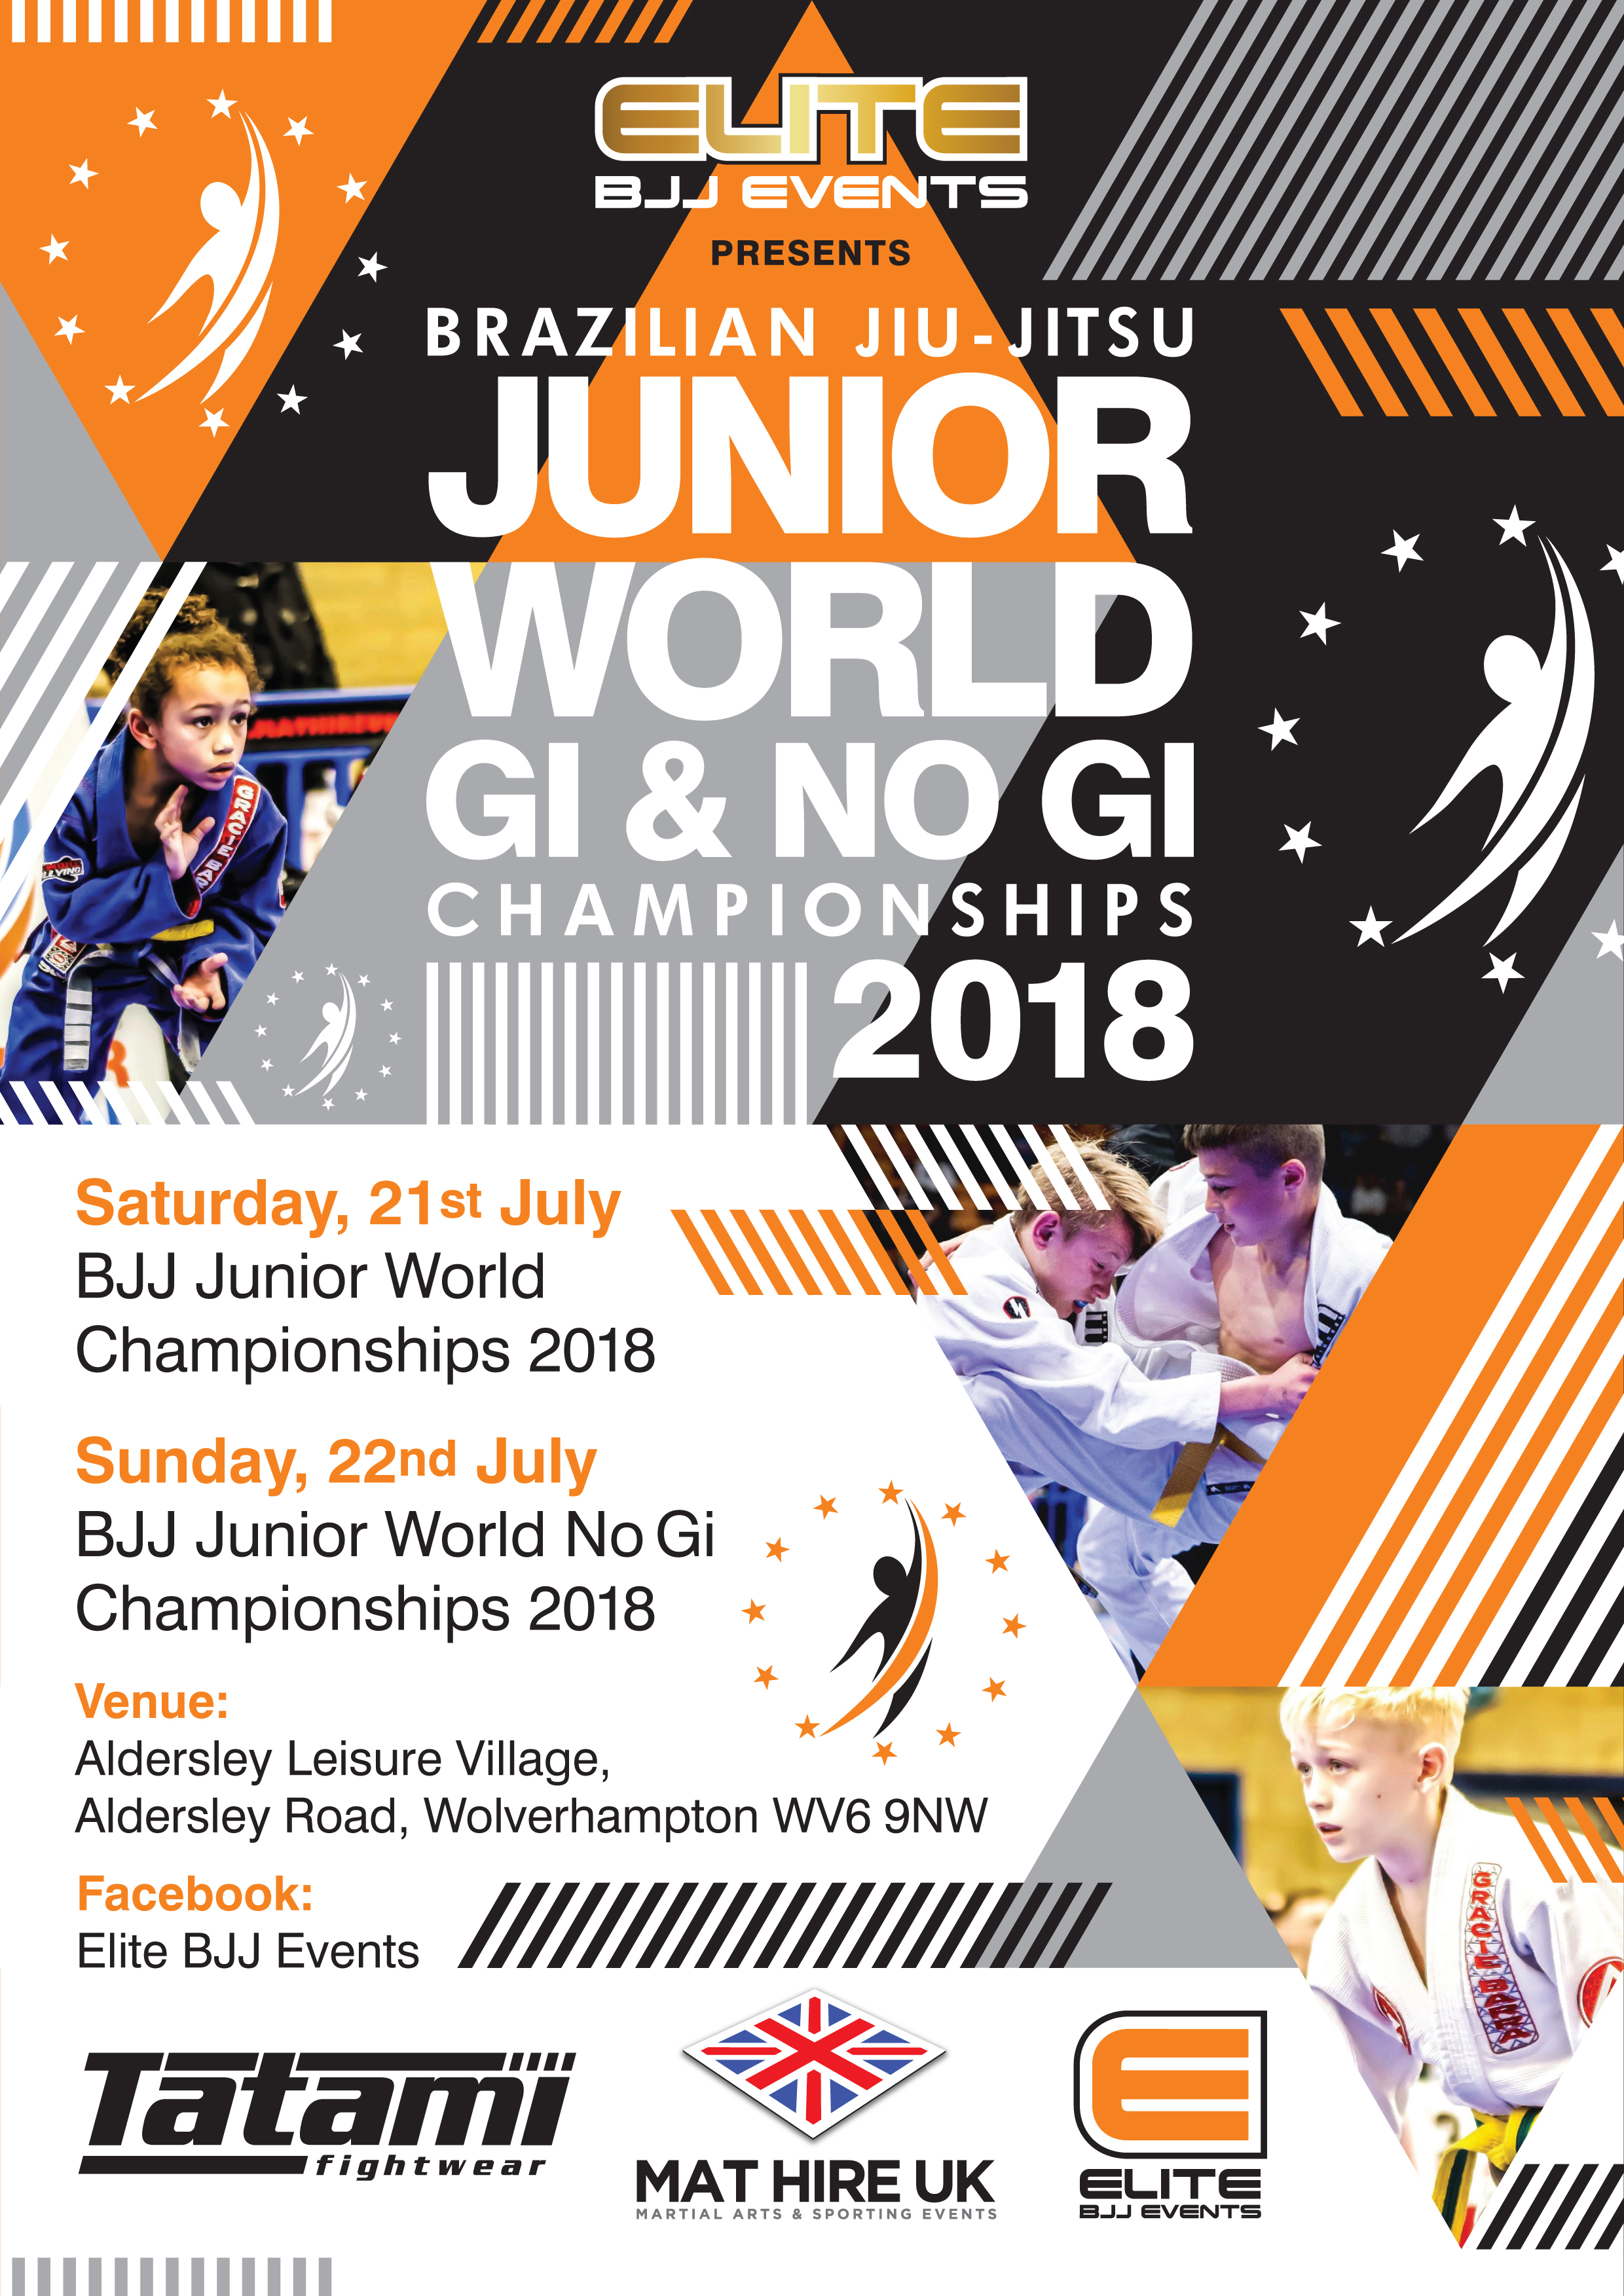 Junior World 2018 Poster